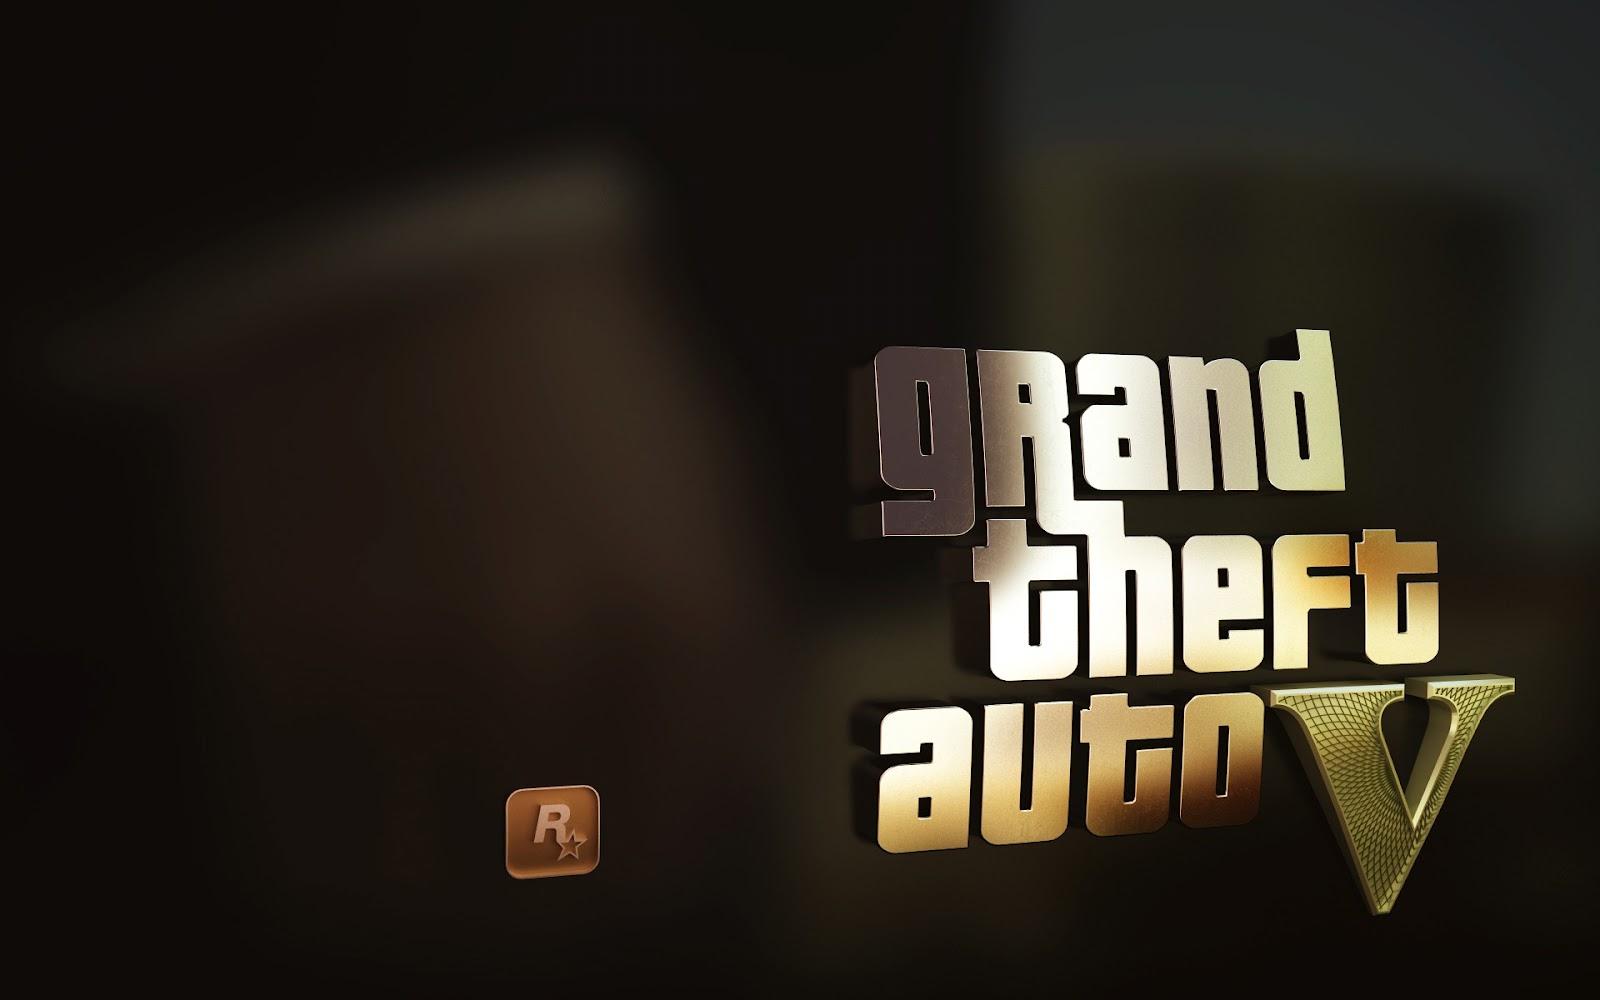 En g zel grand theft auto 5 hd resimleri game wallpapers for Gta v bedroom wallpaper